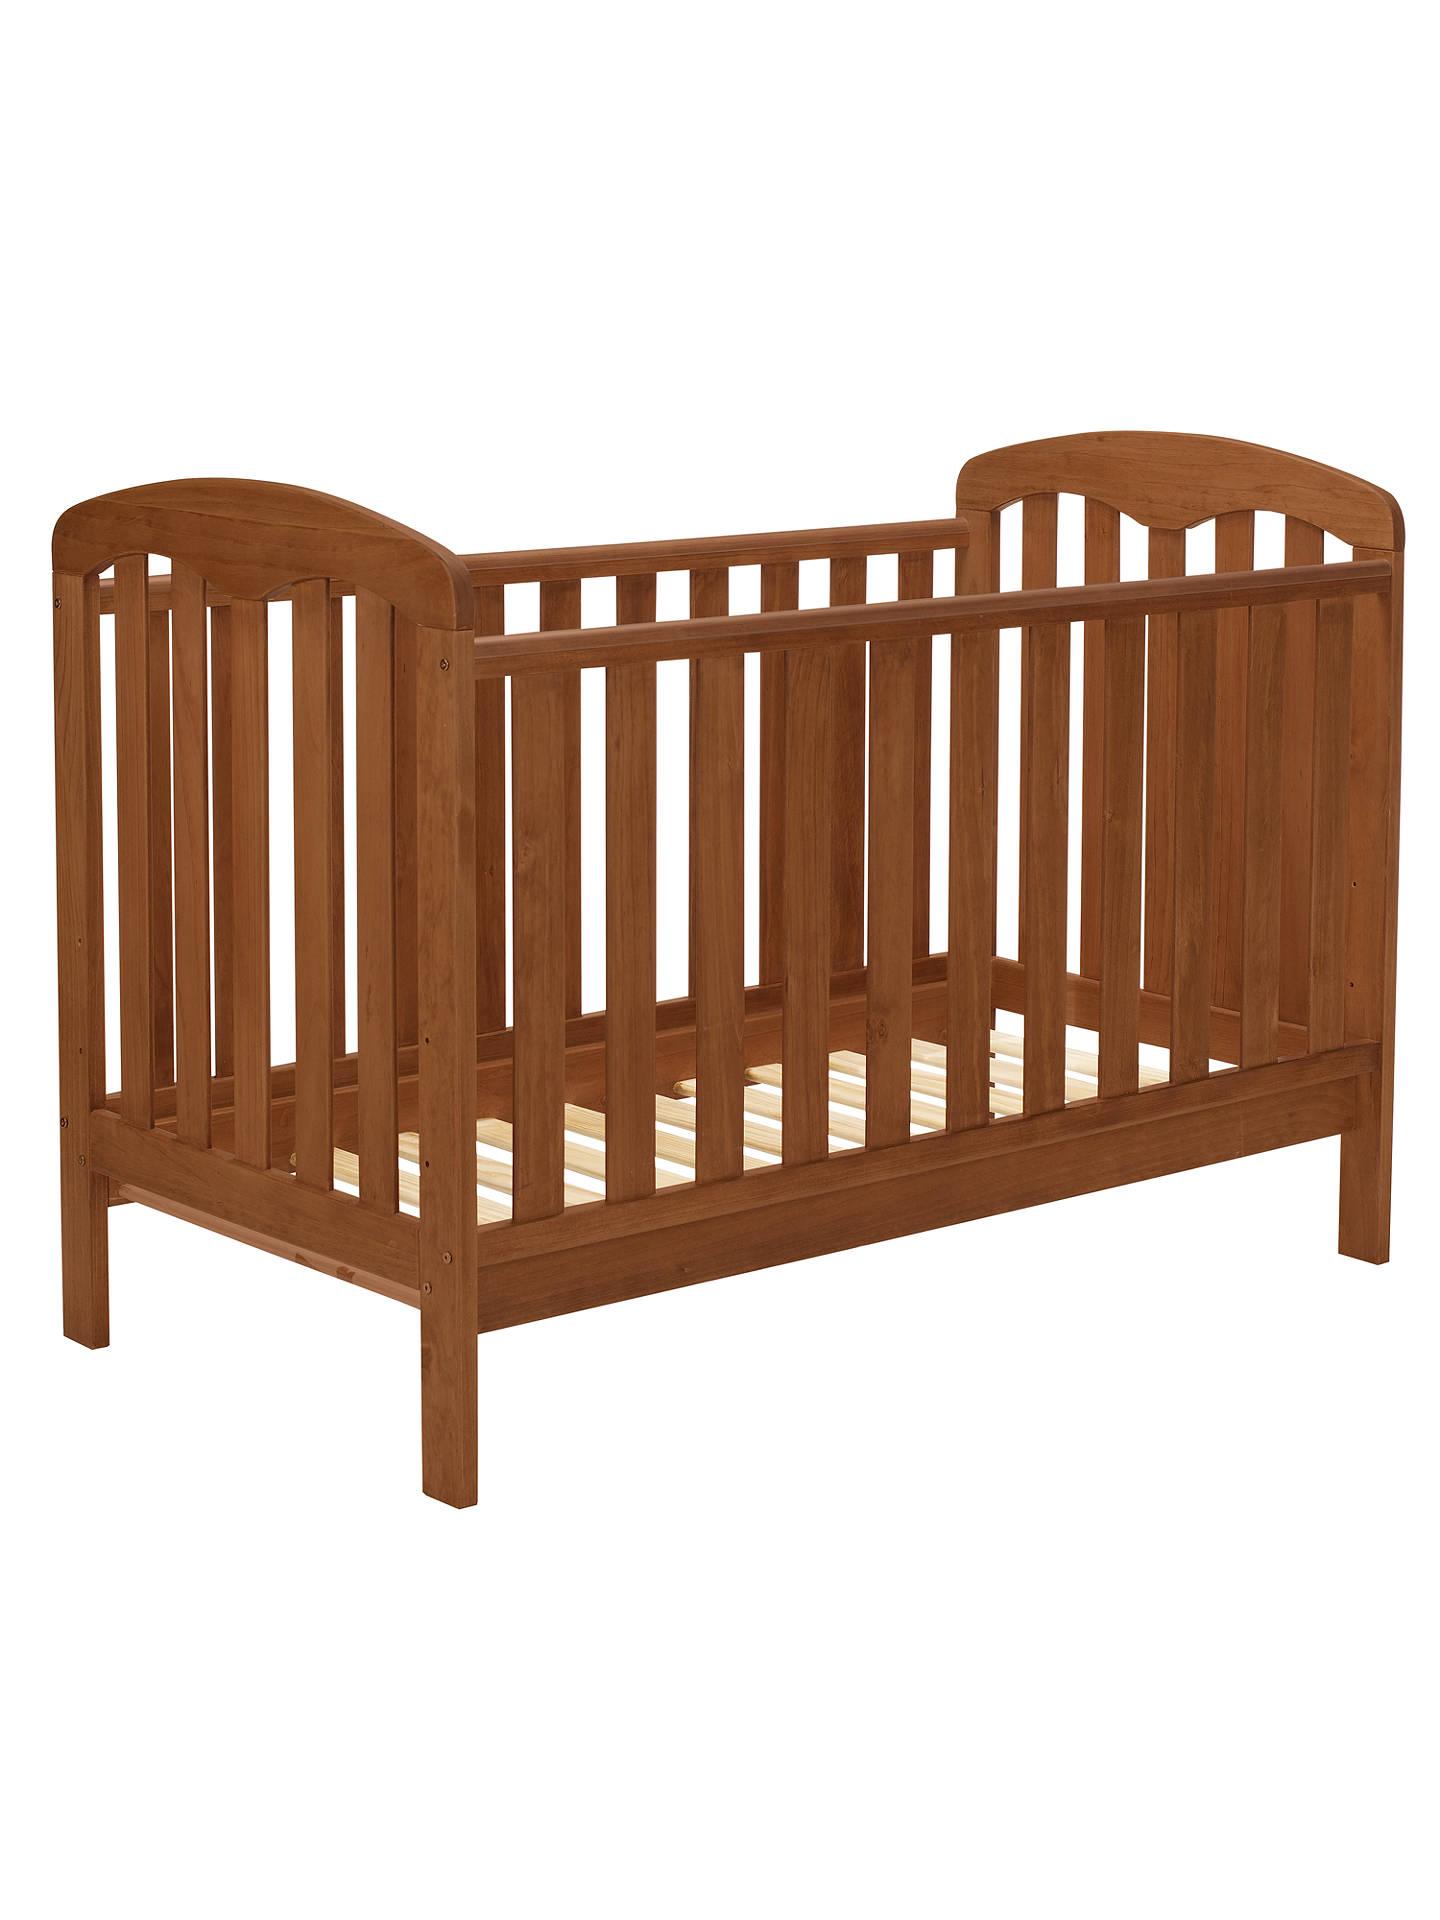 bundle of John Lewis & partners Nursery furniture cot bed, dresser, wardrobe £300 saving - £112.50